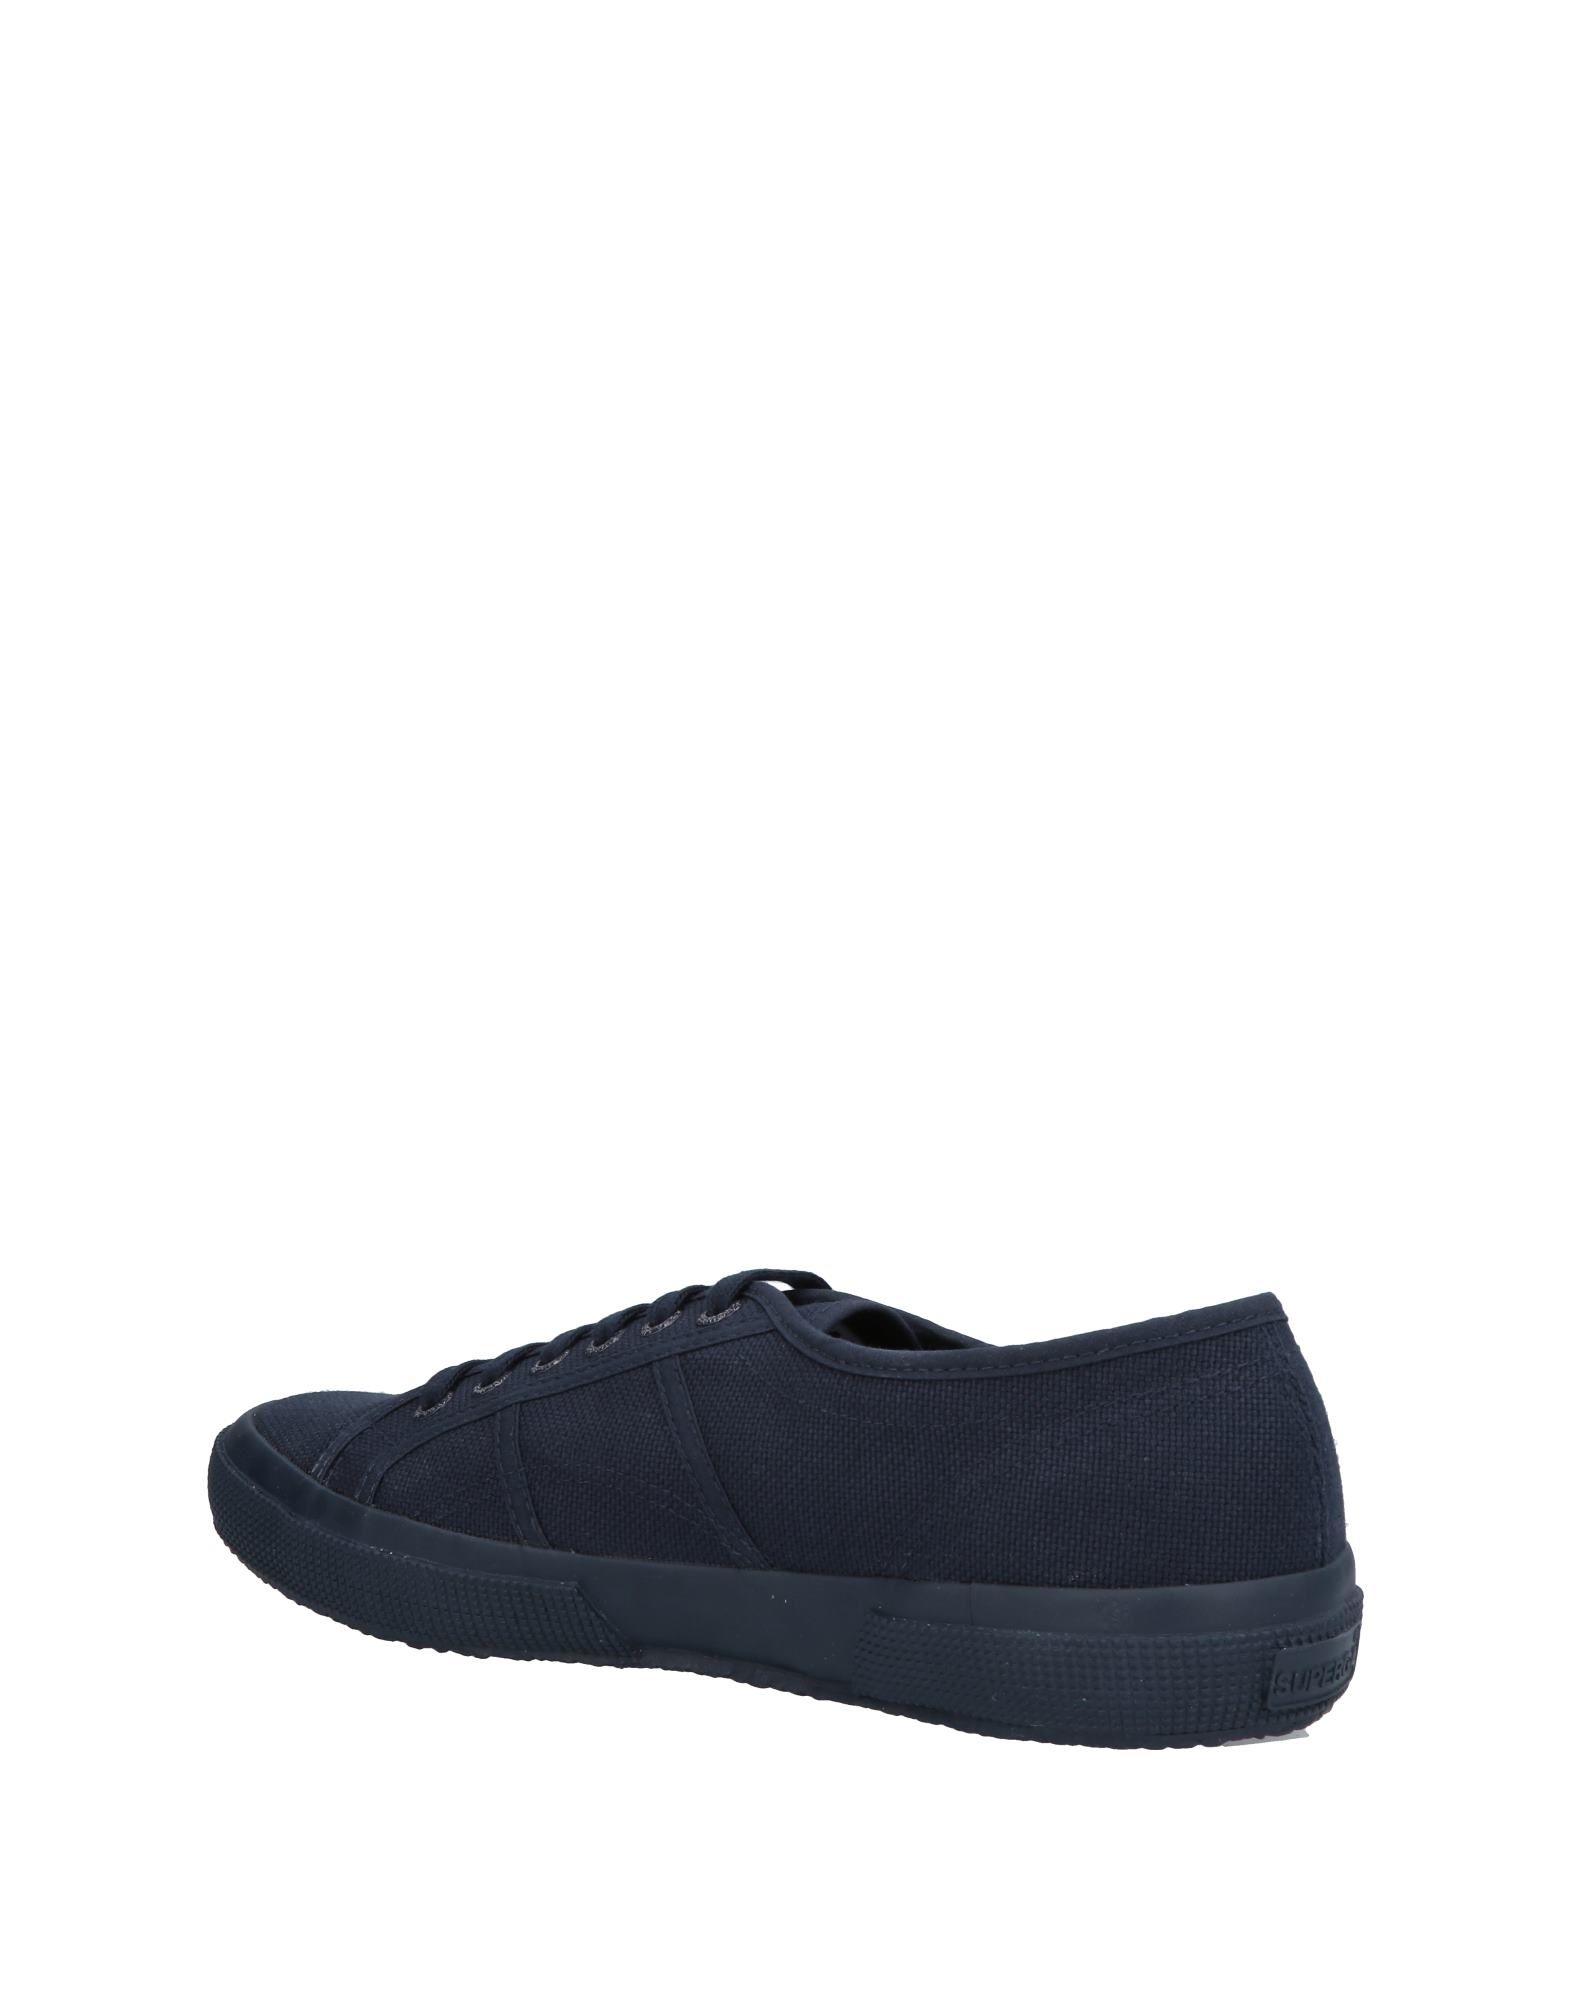 Sneakers Superga® Homme - Sneakers Superga® sur